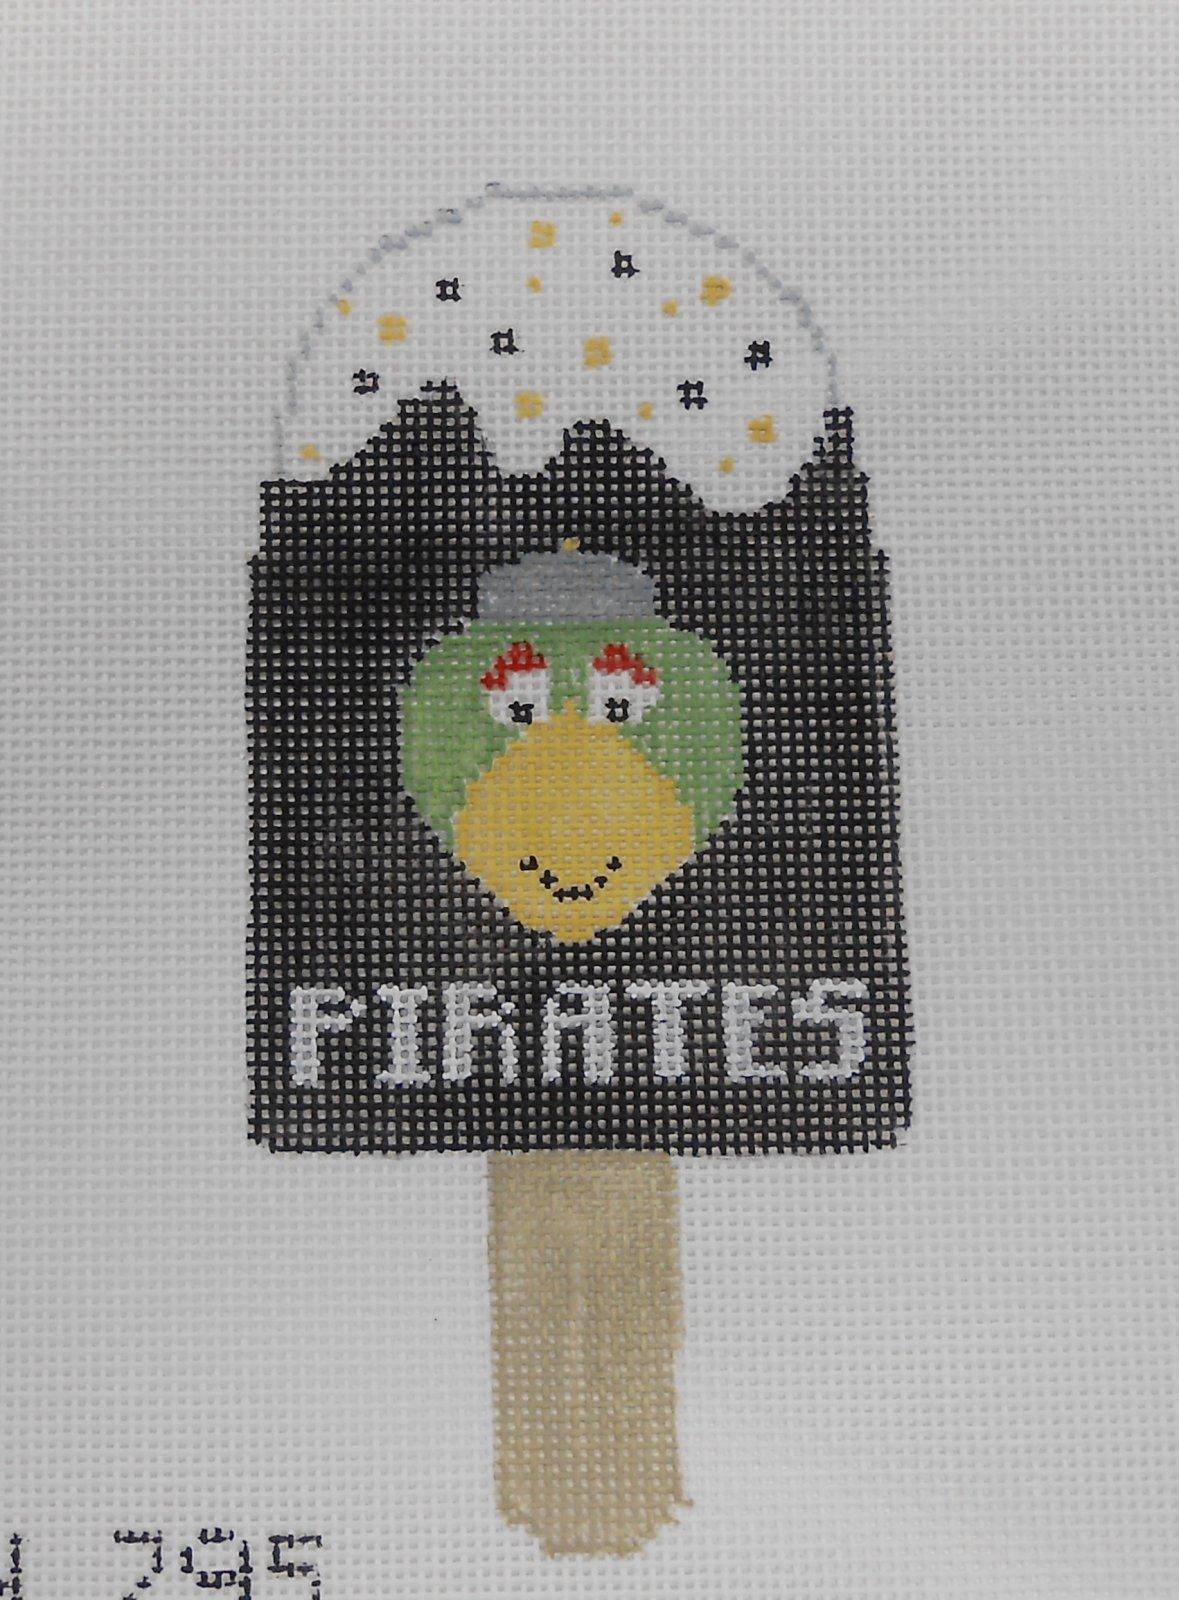 Pittsburgh Pirates Dream Bar